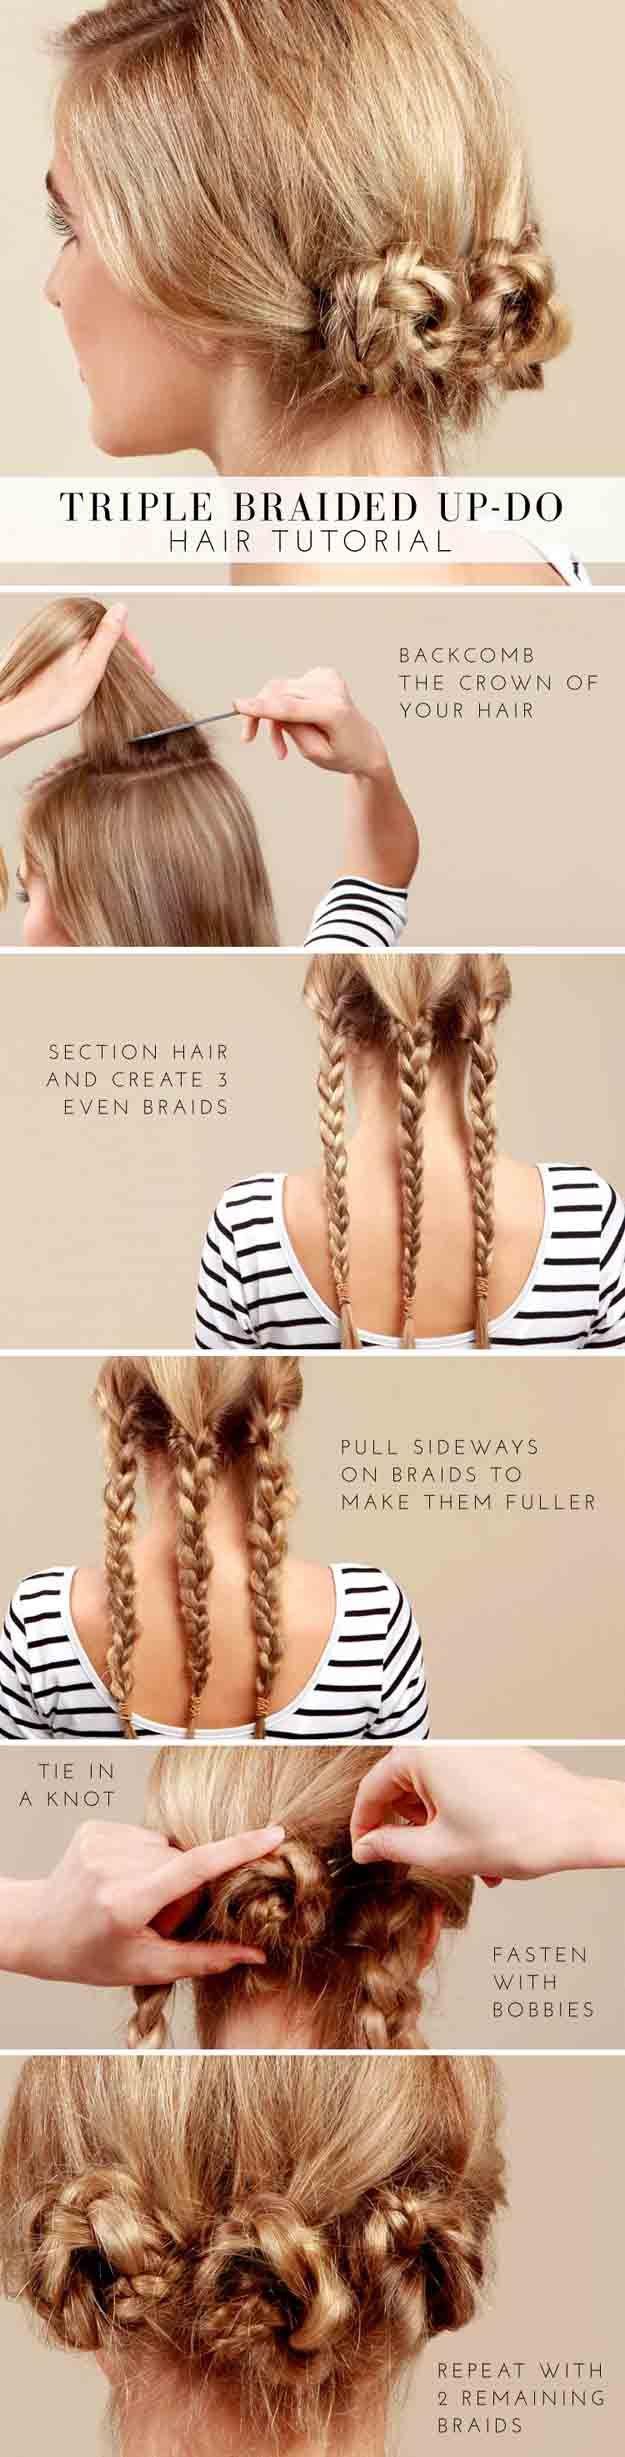 Best Hair Braiding Tutorials - BEAUTY Lulus How To Triple Braided Bun Tutorial -...